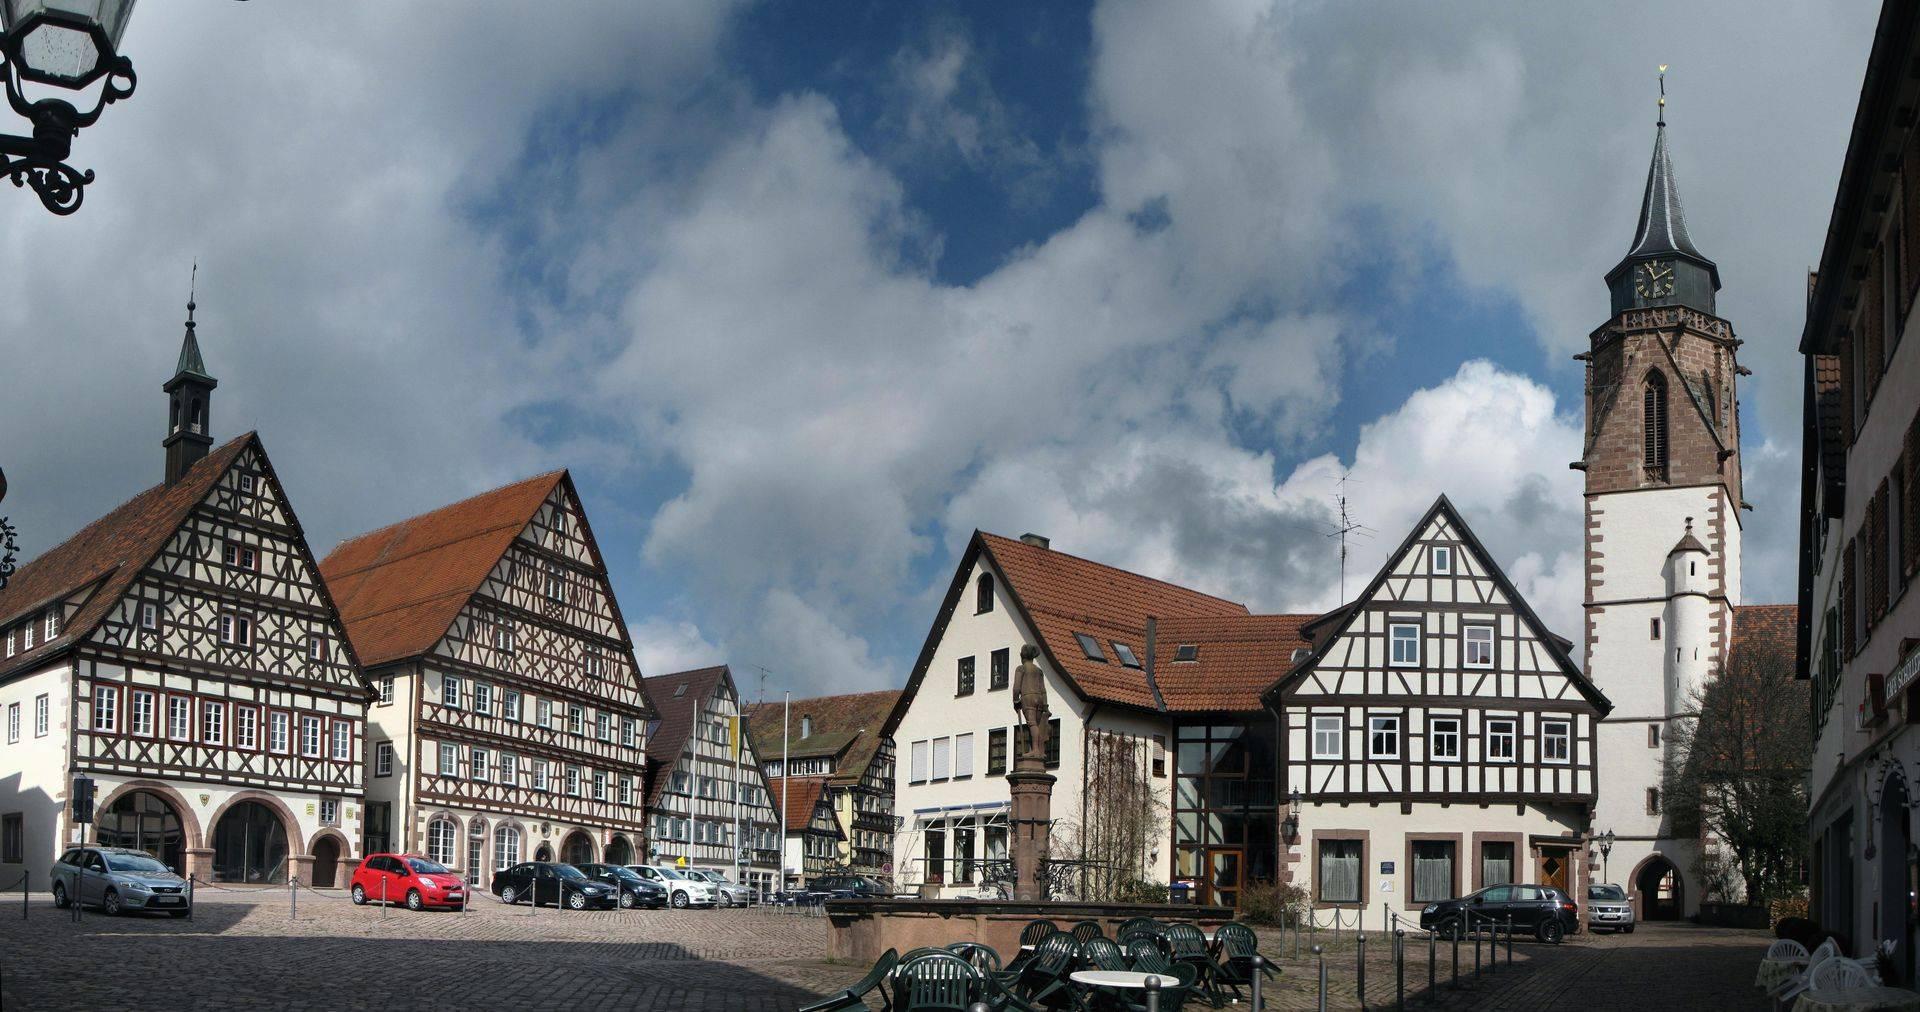 Marktplatz in Dornstetten